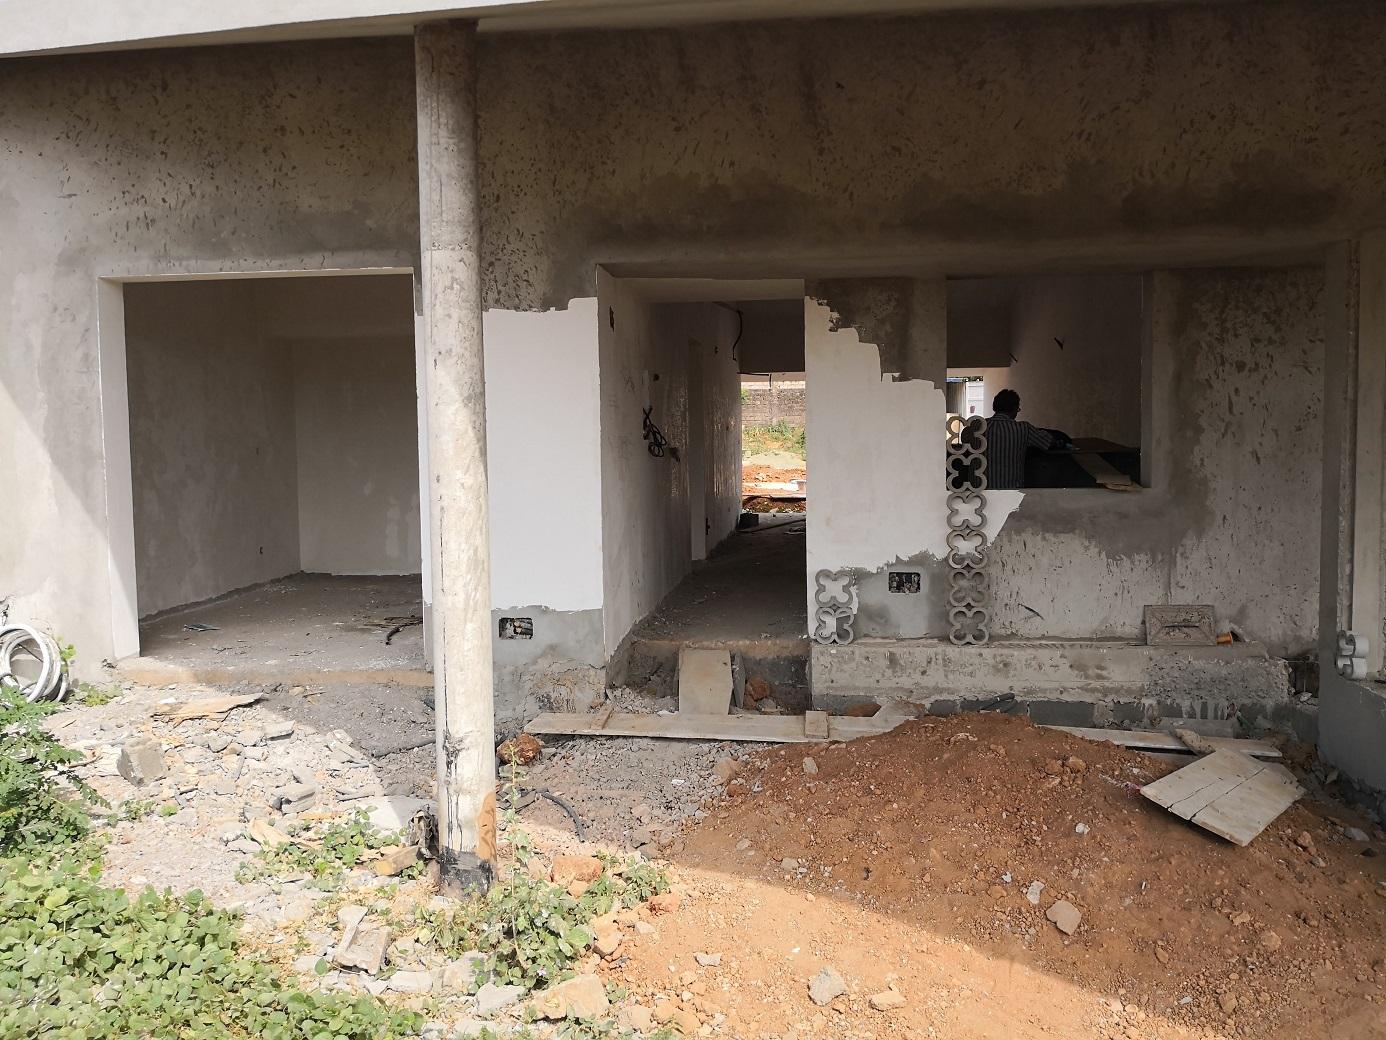 Civil construction work in Guinea-Bissau